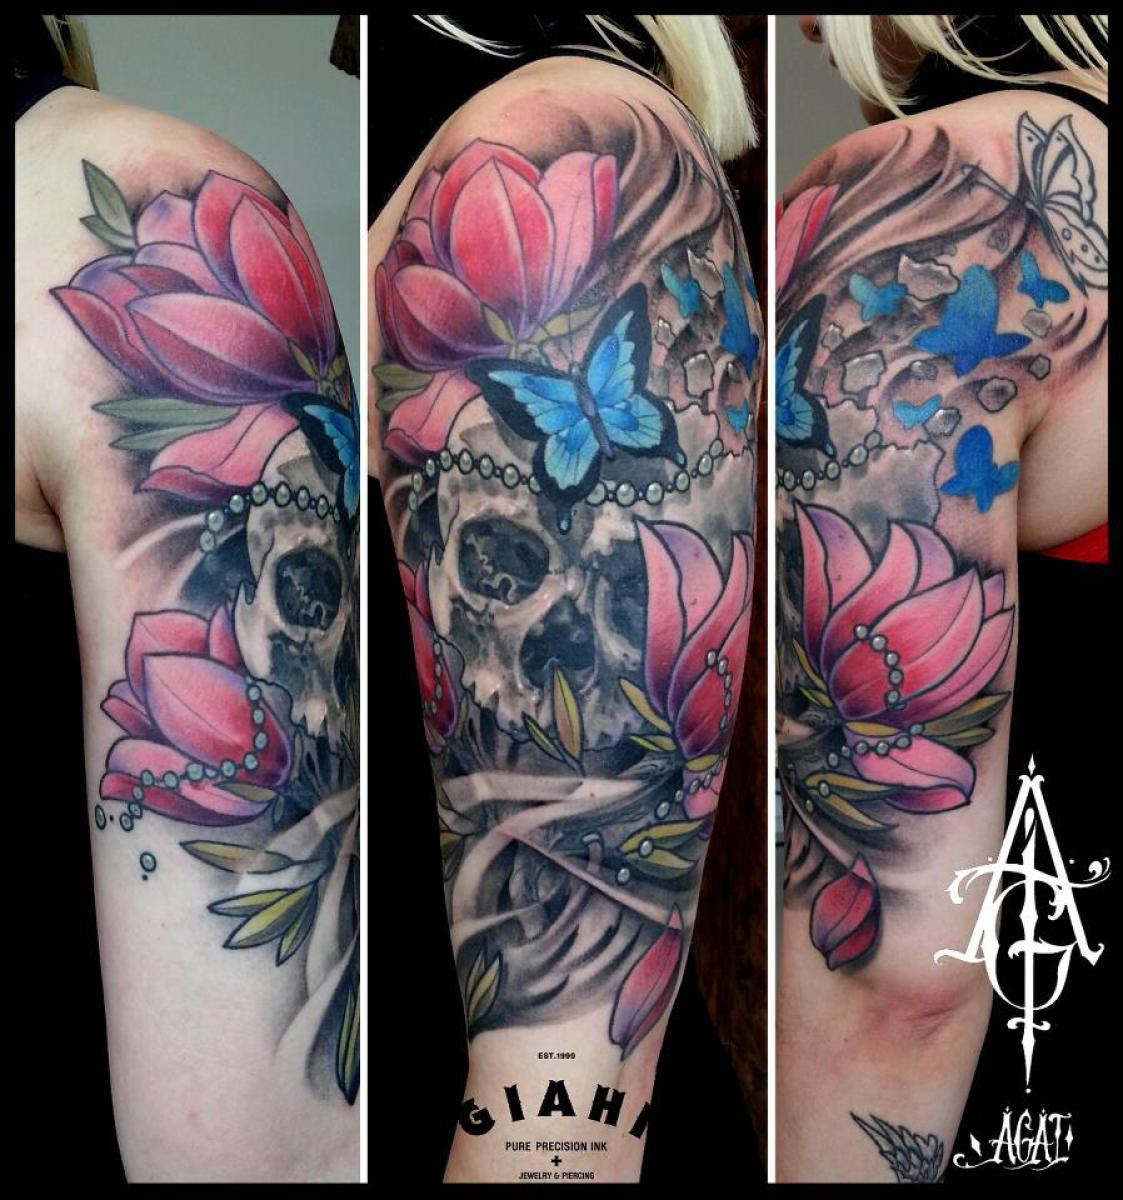 Cracked Butterfly Flowers Skull Tattoo By Agat Artemji Best Tattoo